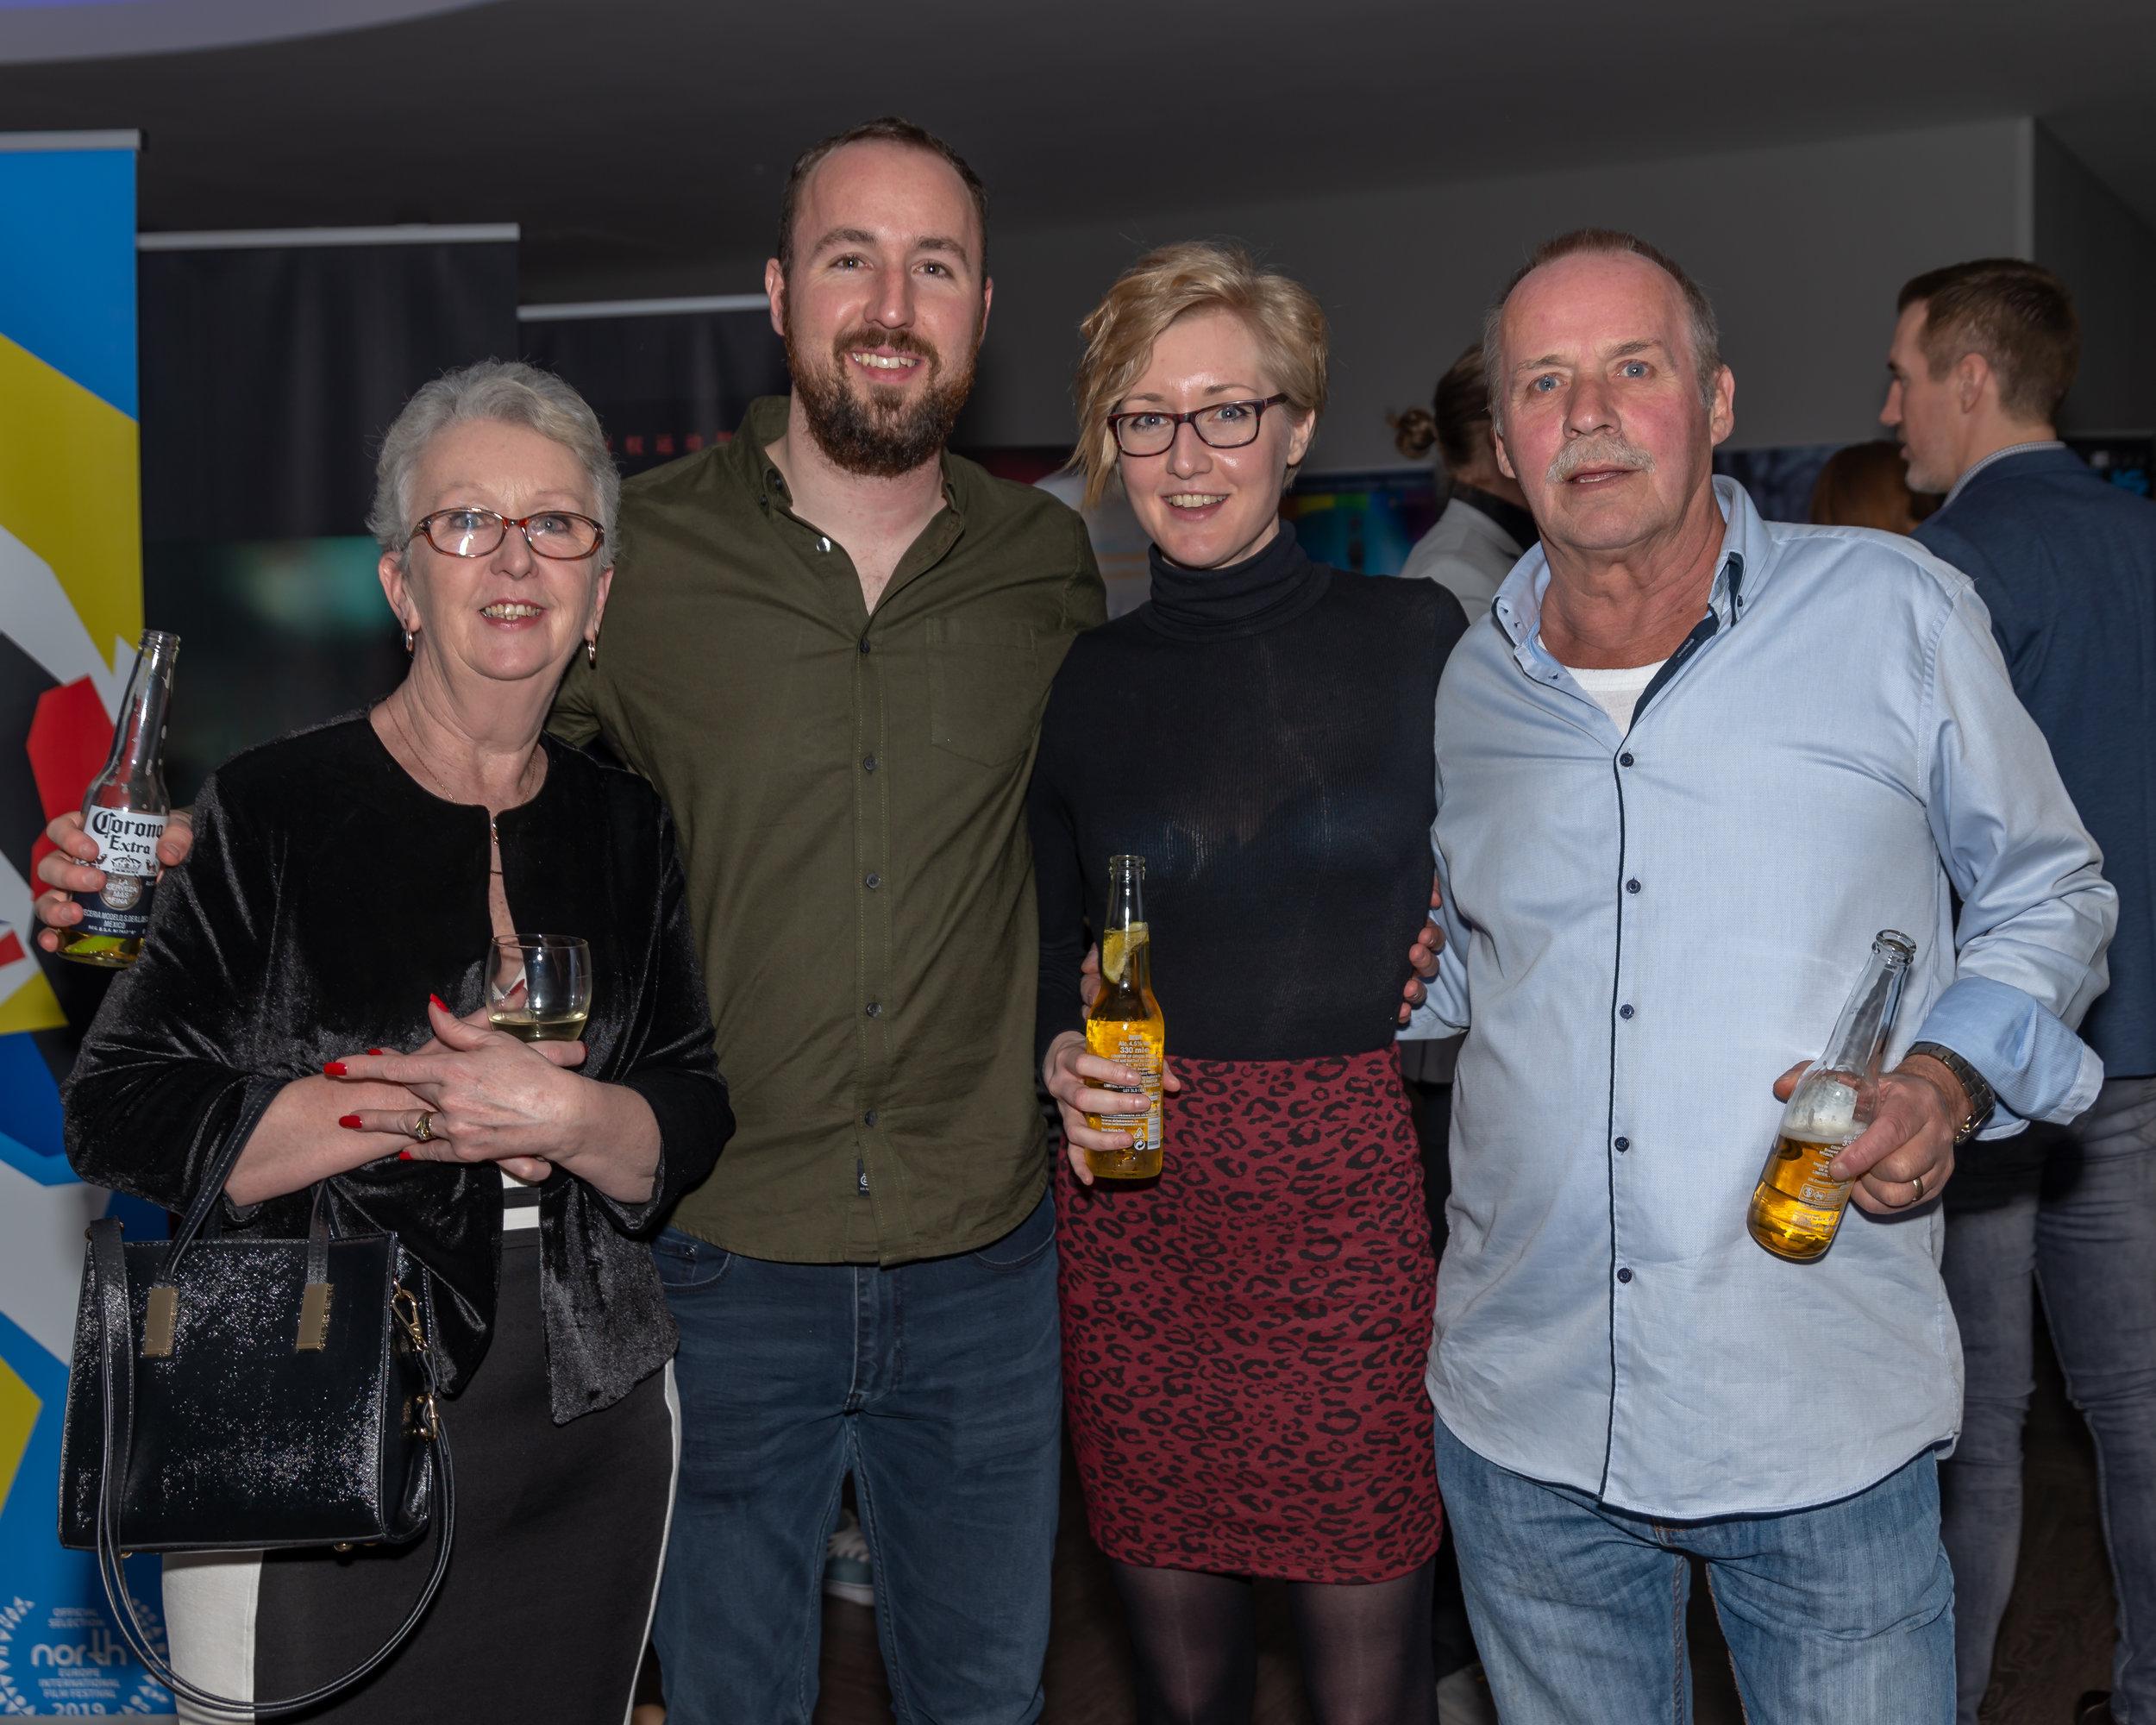 Maureen Hickford, Dan Hickford, Sarah Walkden, and Paul Hickford at the North Europe International Film Festival in London February 22, 2019    Courtesy of Stuart Watson